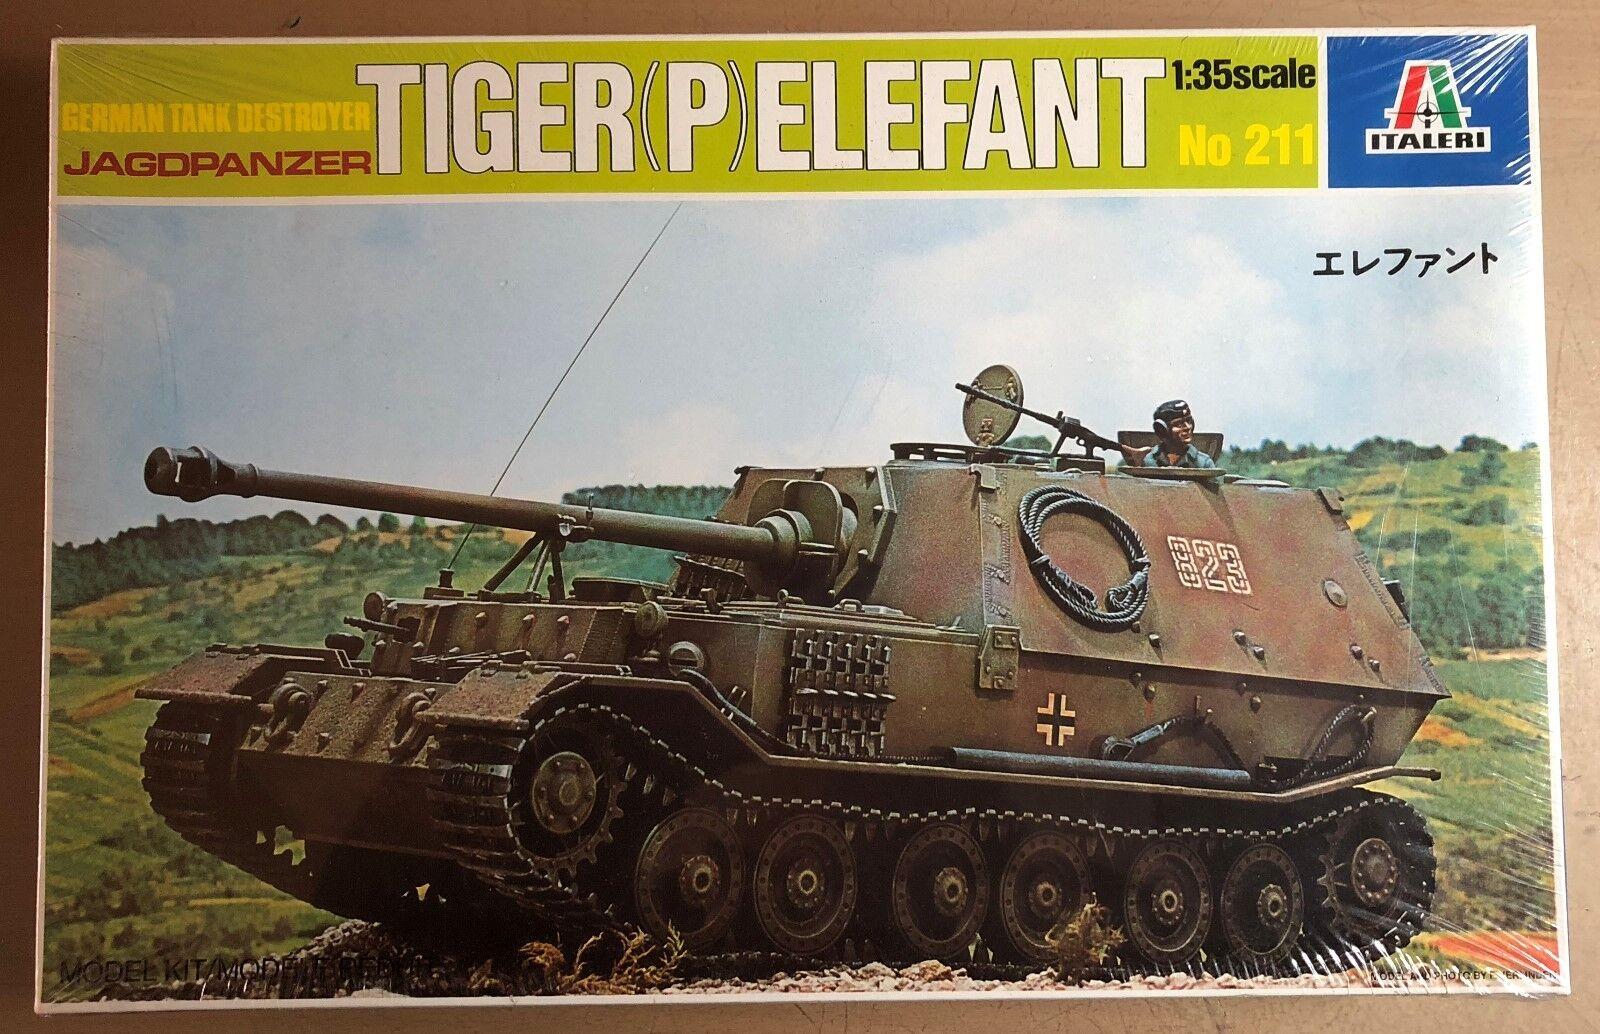 ITALERI 211 - JAGDPANZER TIGER (P) ELEFANTGERMAN TANK DESTROYER - 1 35 PLASTIC